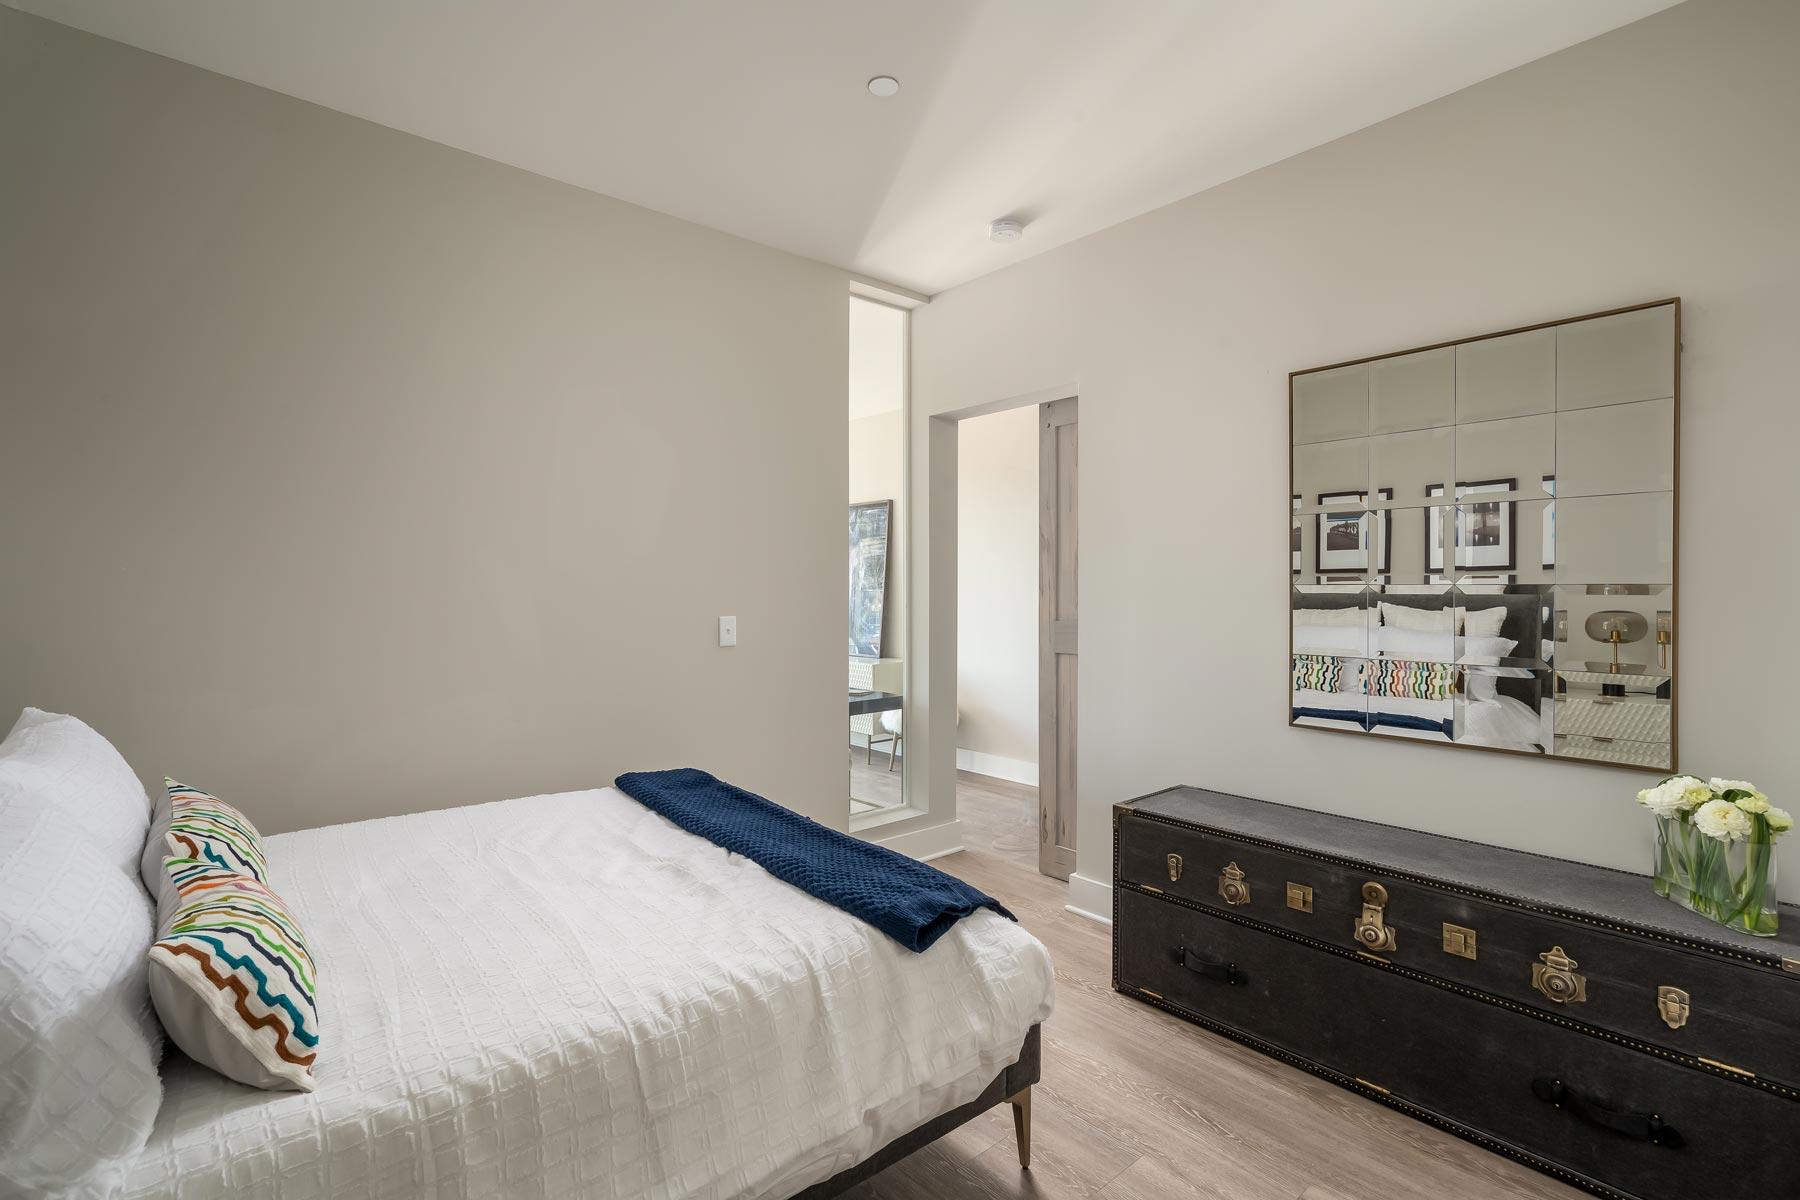 Valencia apartment bedroom